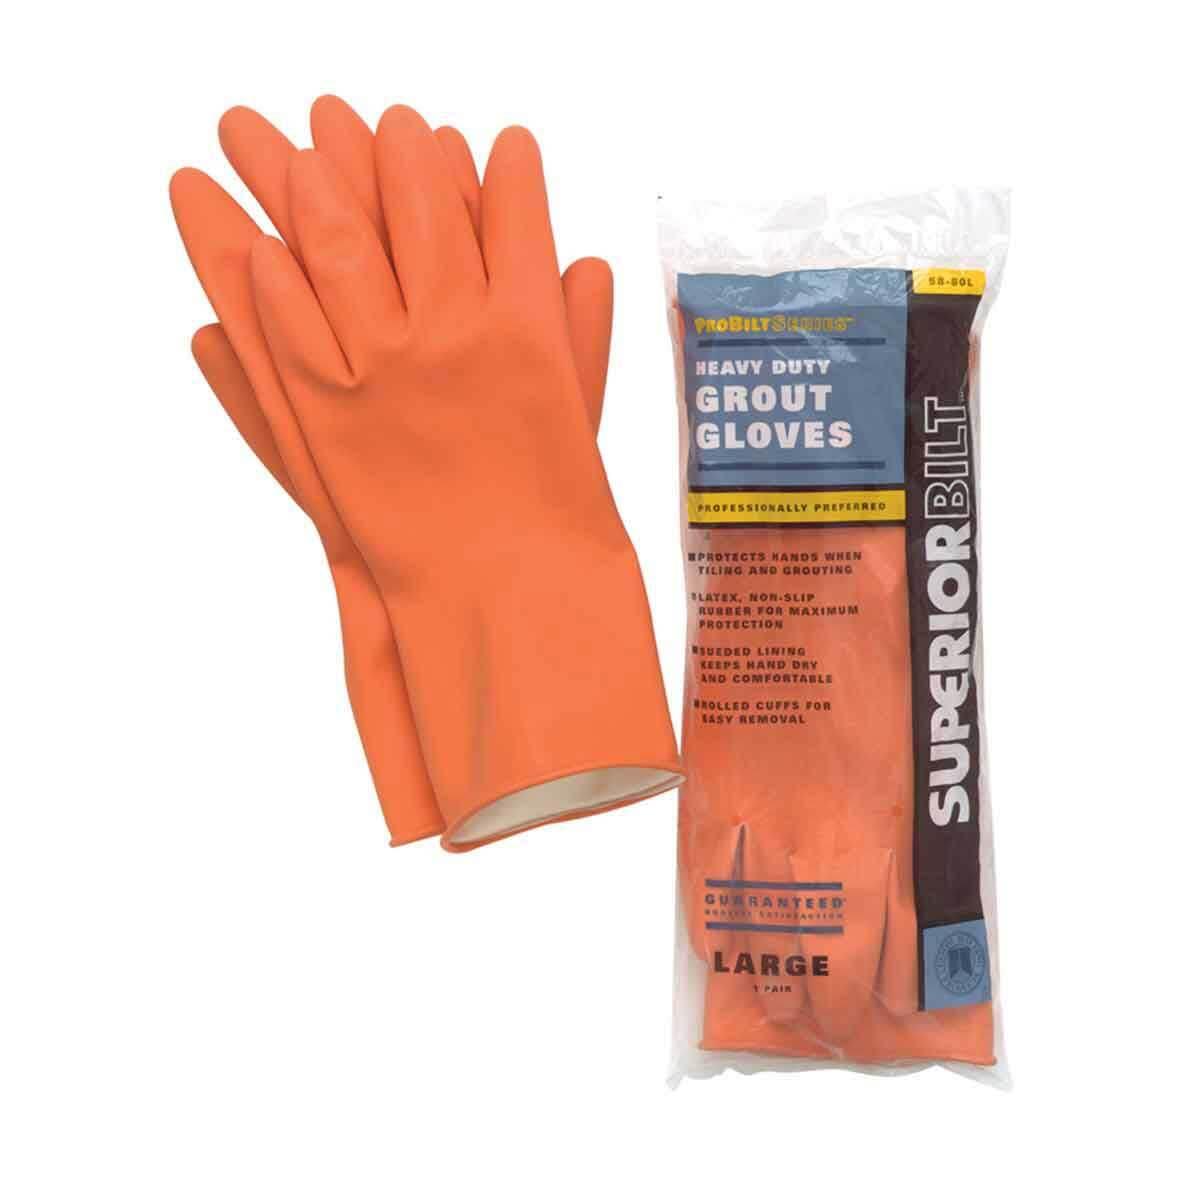 Superiorbilt Heavy-duty Grout Gloves. Contractors Direct